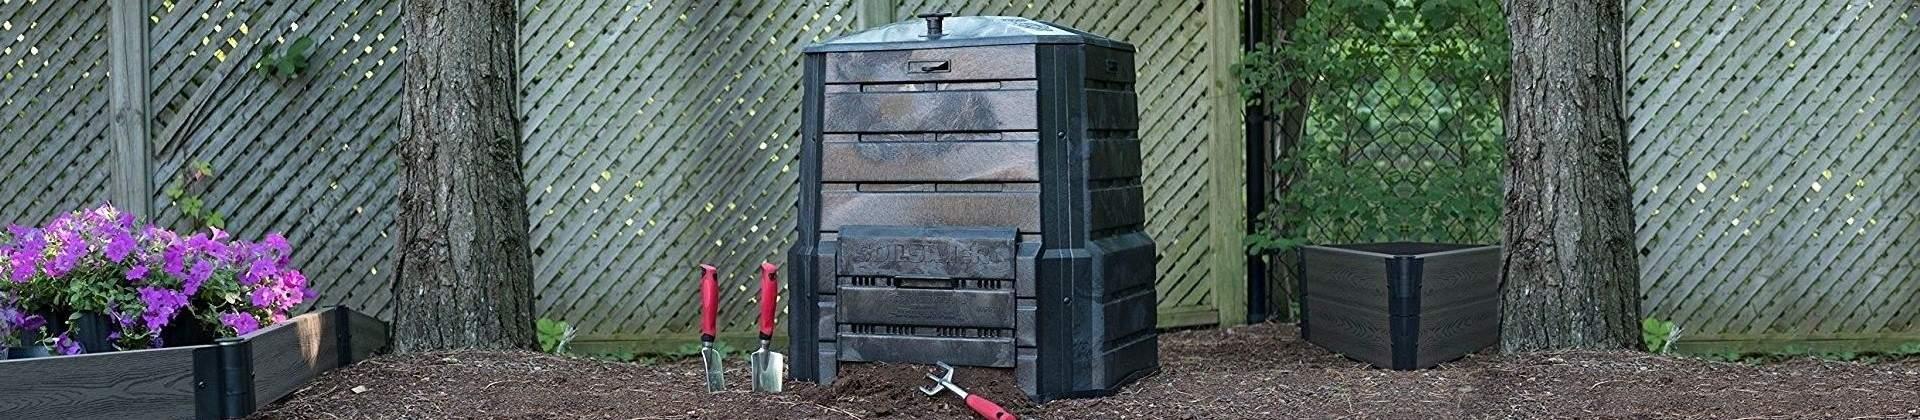 Best Compost Bins Reviewed